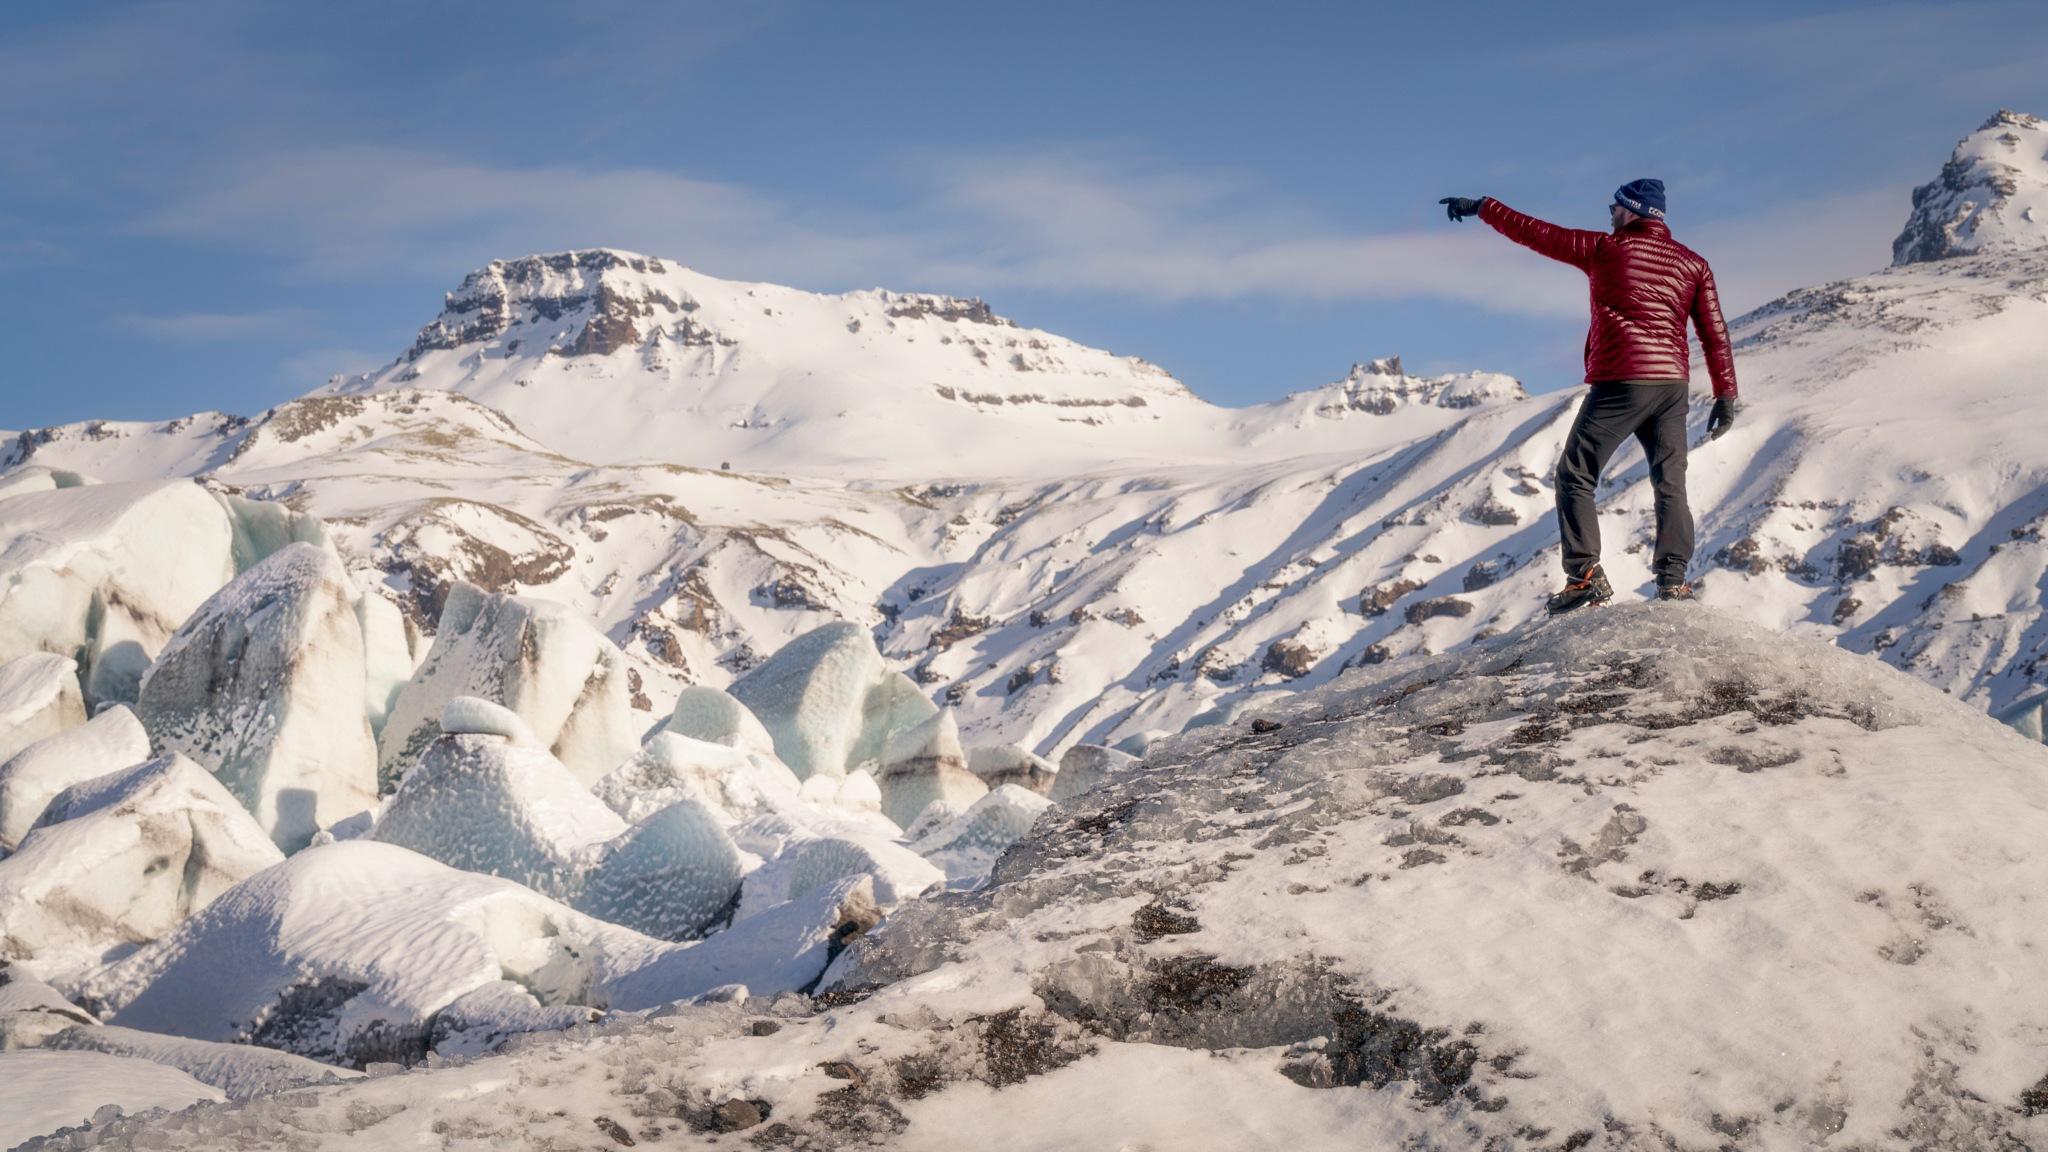 On Svínafellsjökull Glacier by William Yu Photography